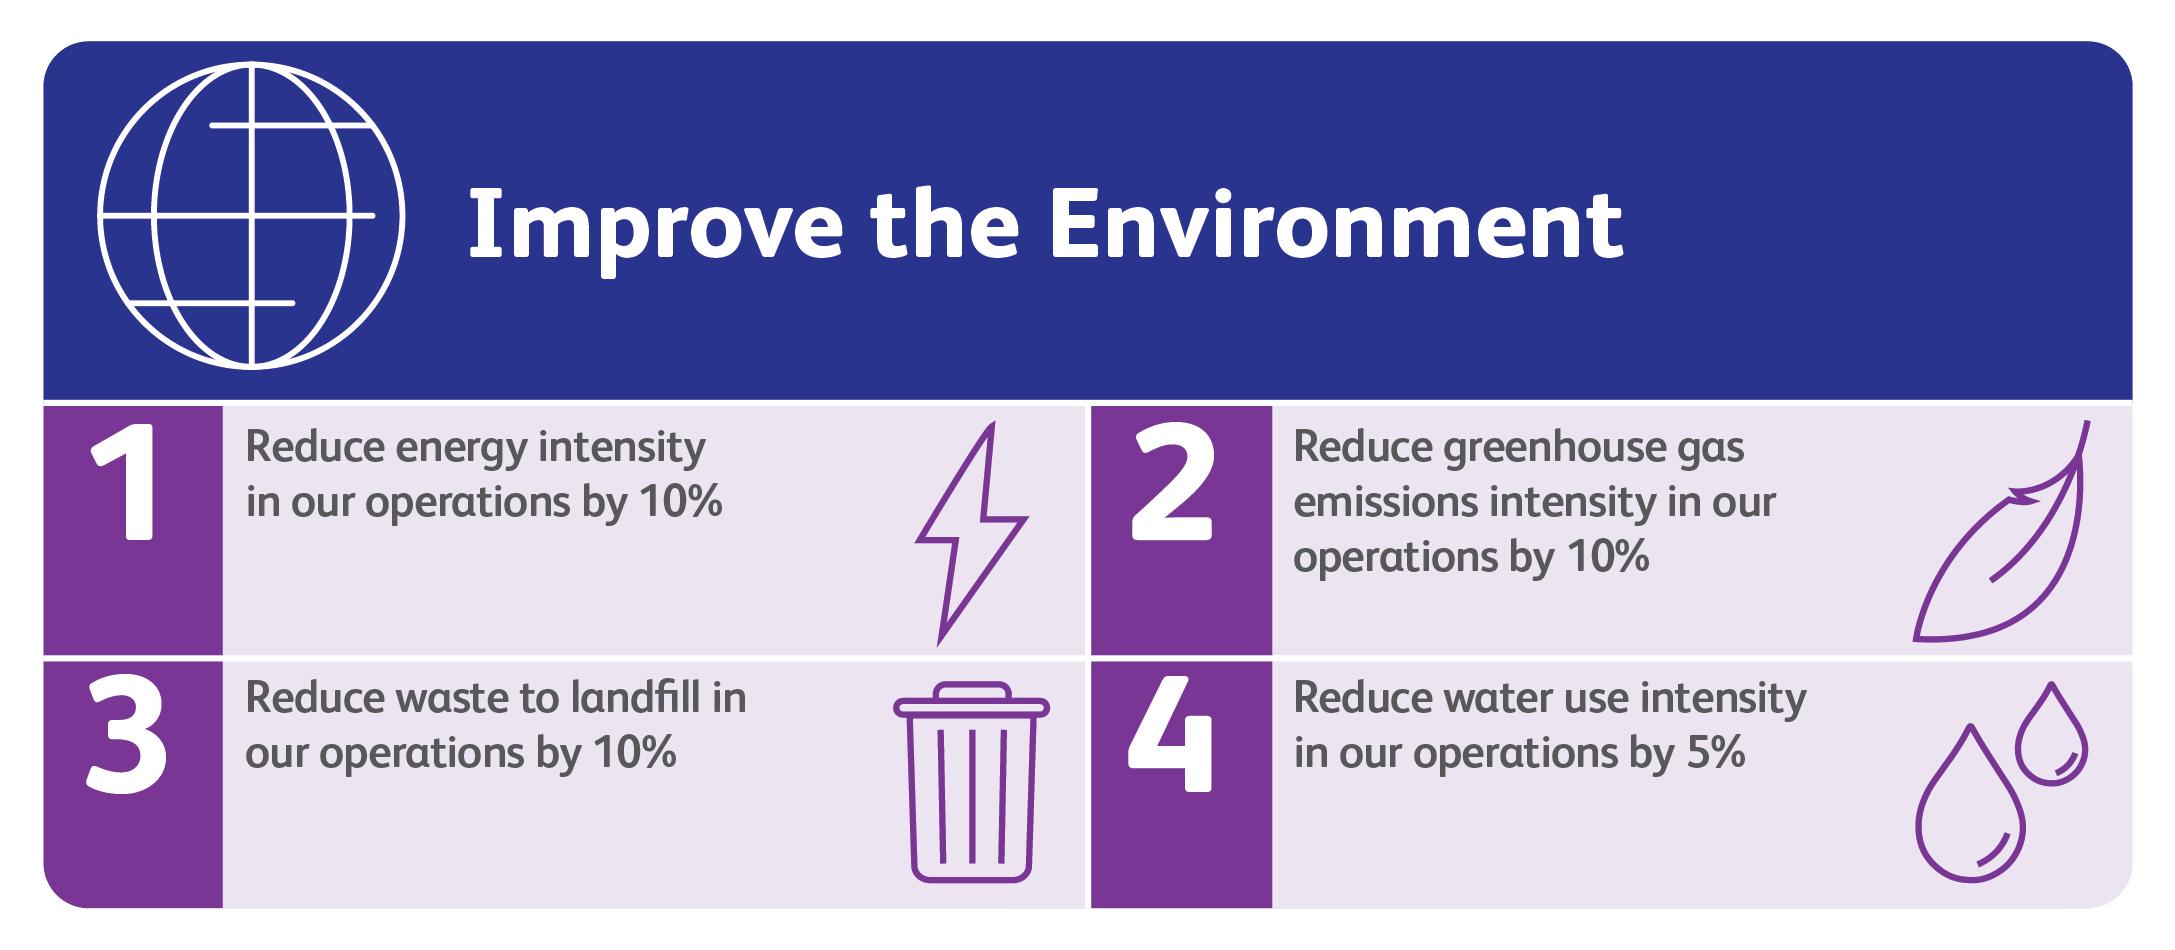 2025 environmental goals infographic